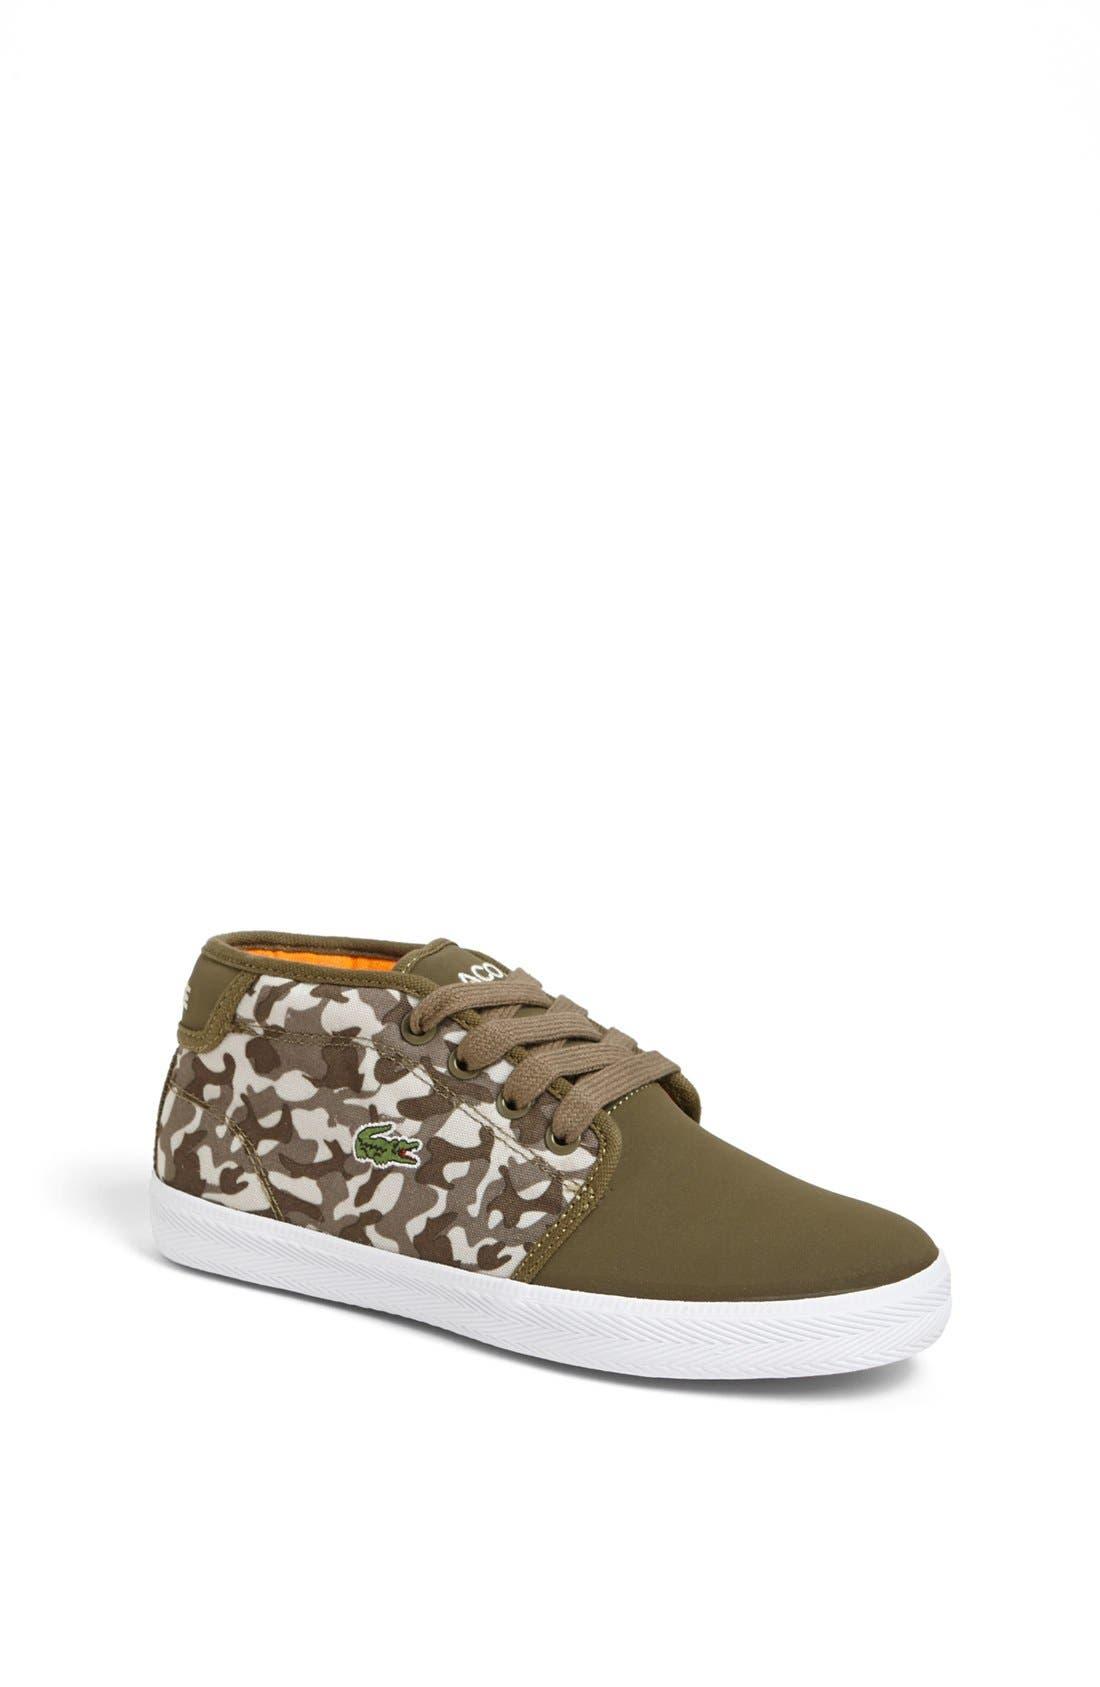 Alternate Image 1 Selected - Lacoste 'Ampthill' Sneaker (Baby, Walker, Toddler, Little Kid & Big Kid)